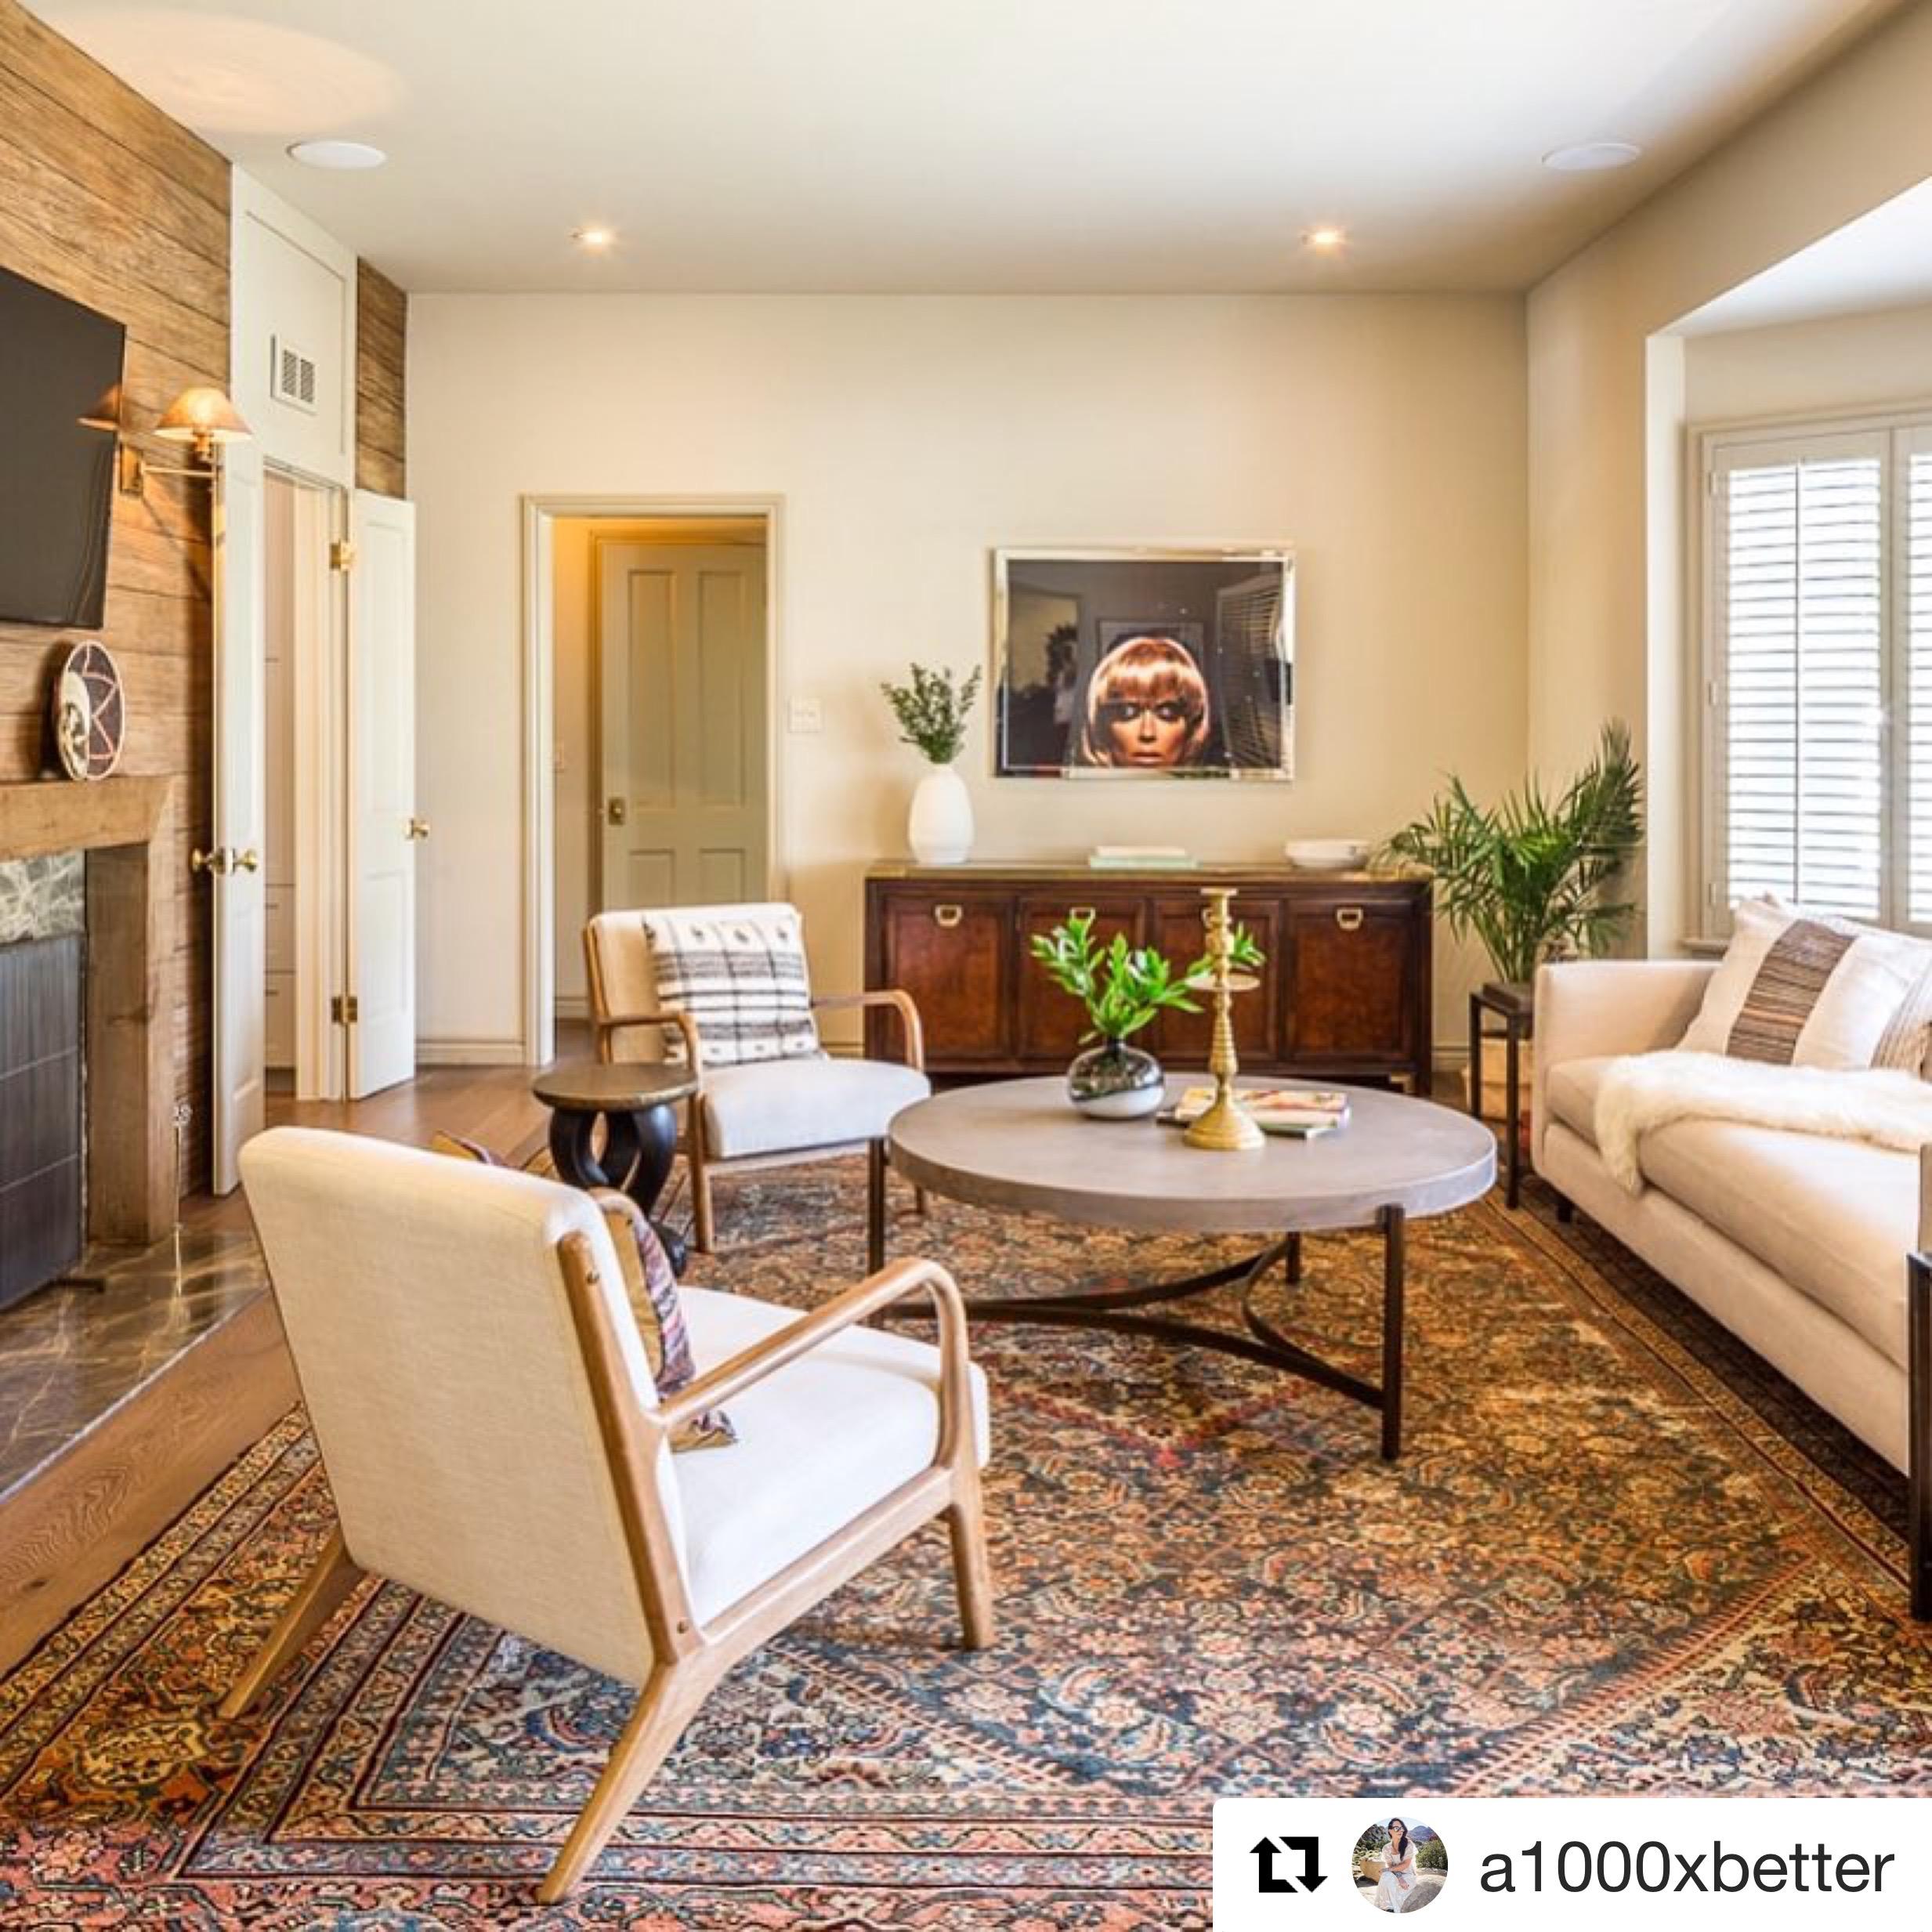 A1000xbetter Design, Los Angeles, CA